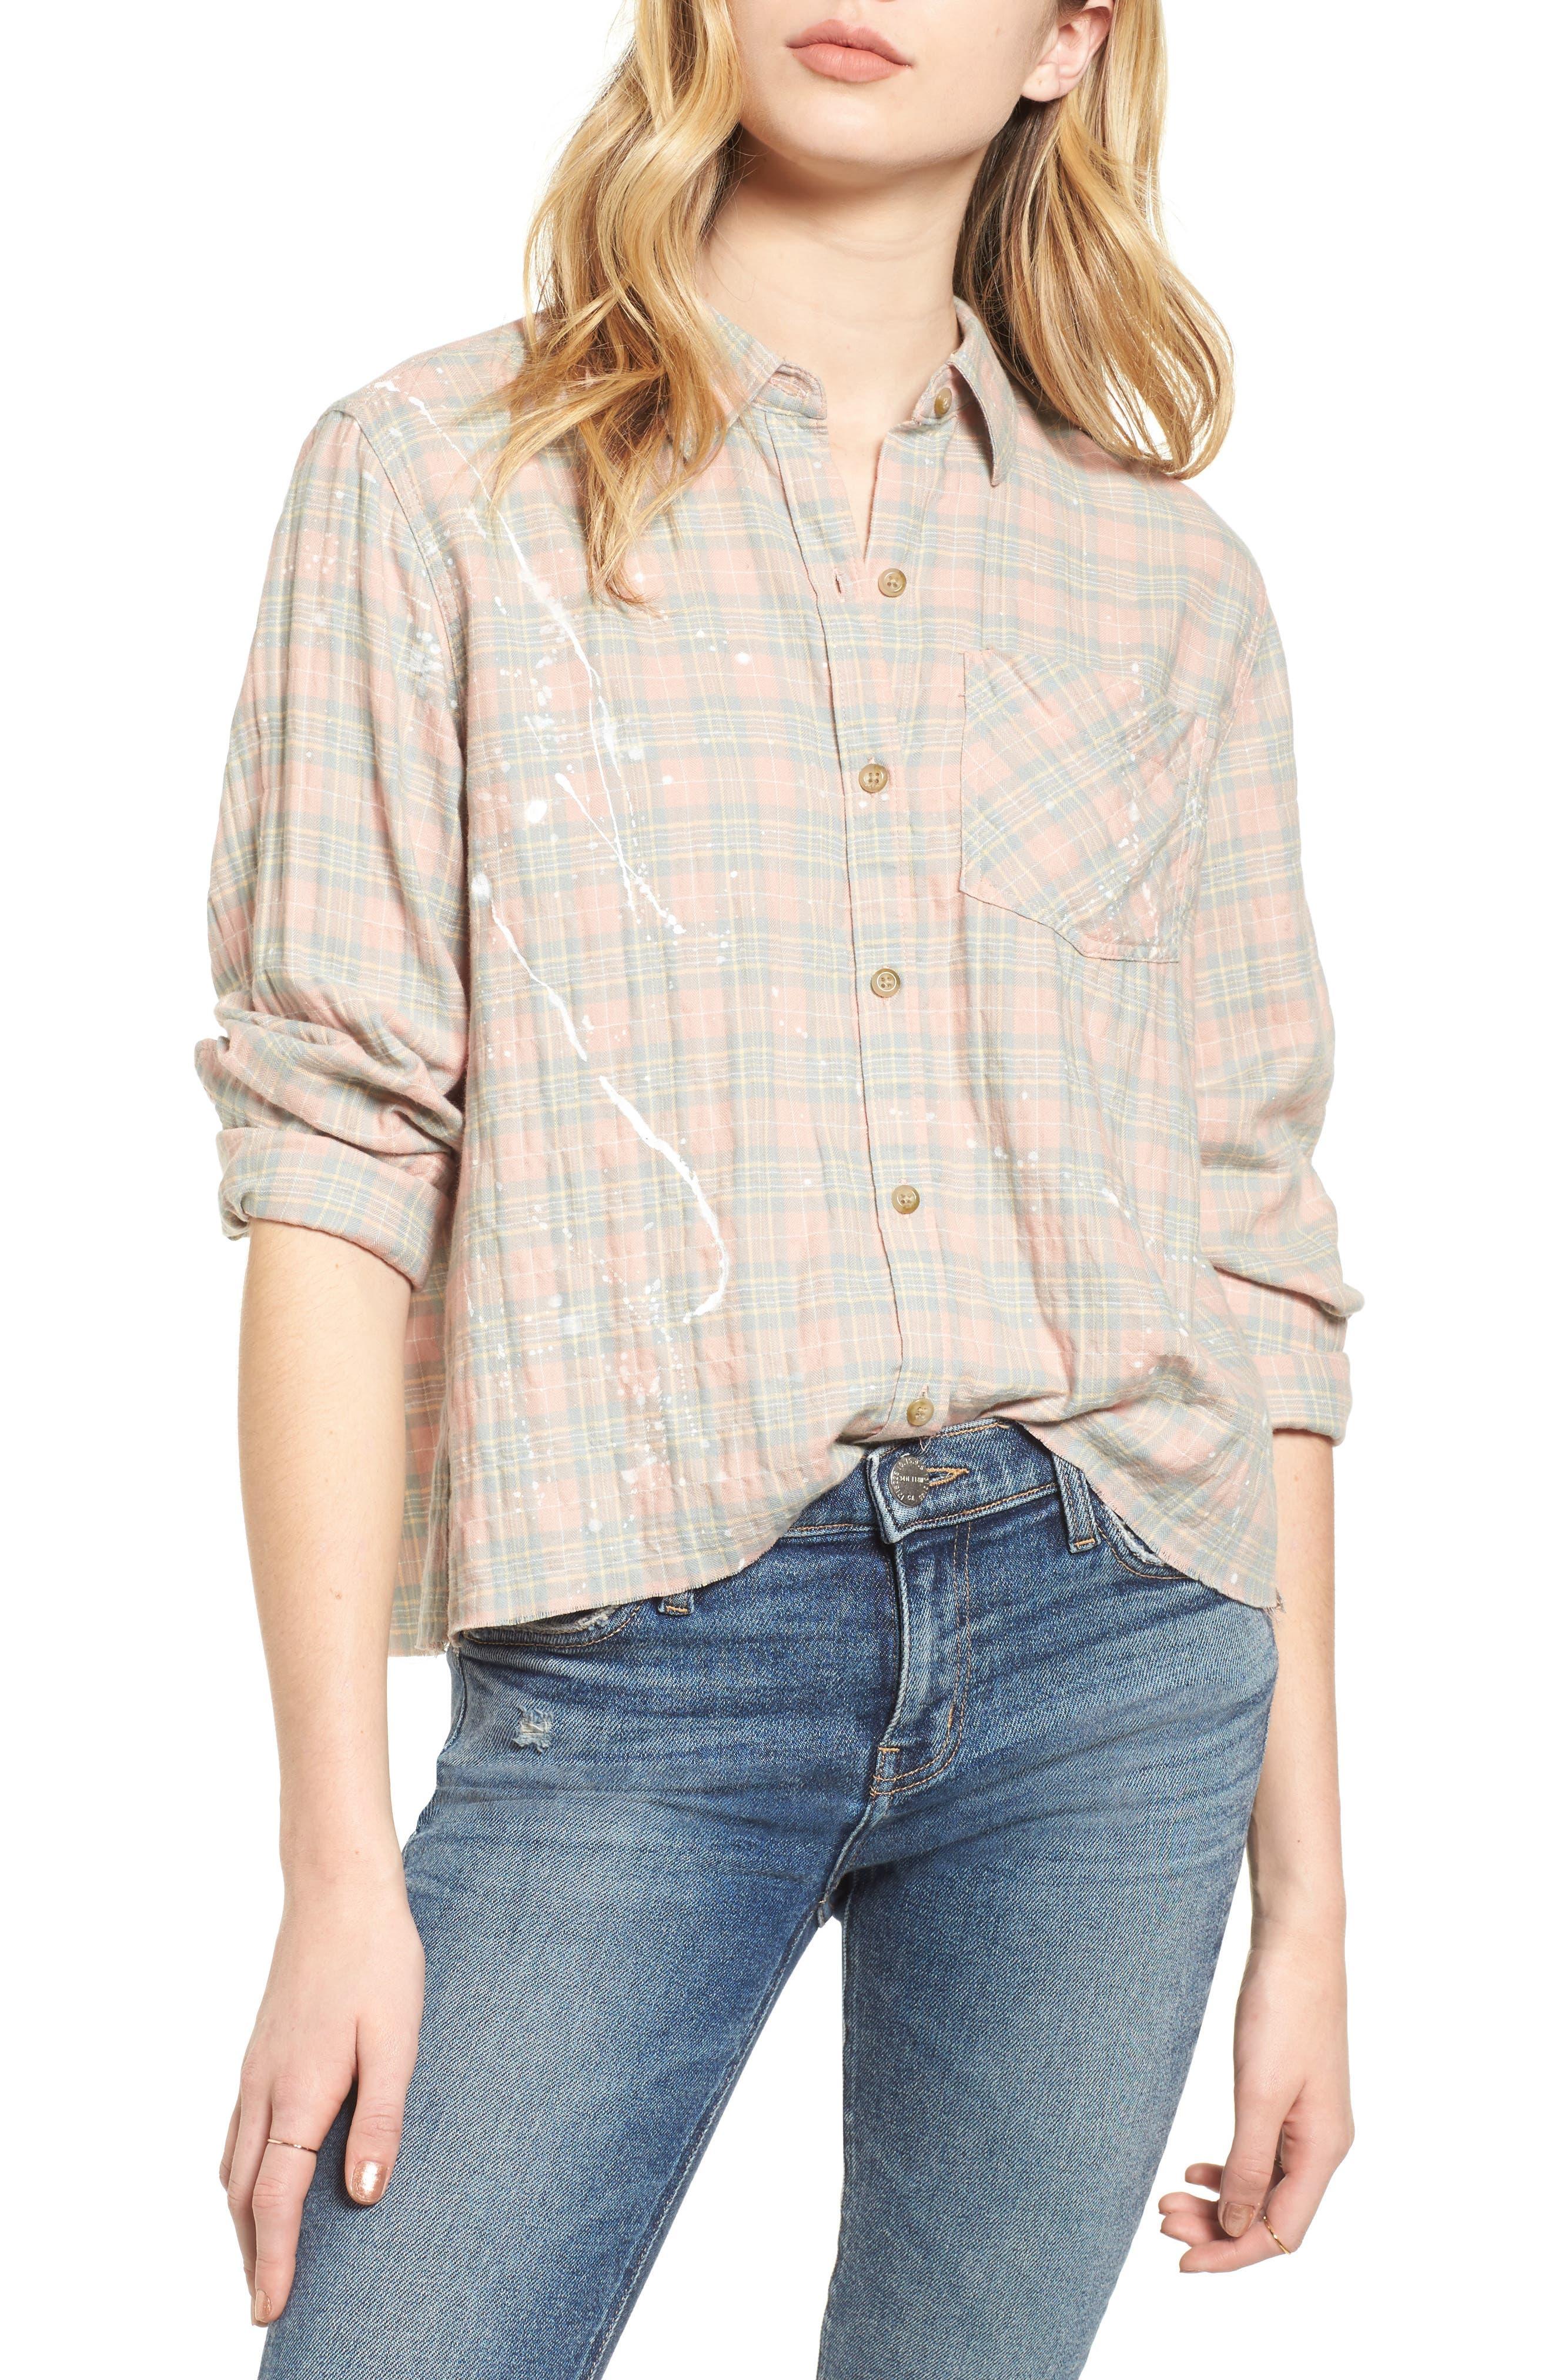 Main Image - Current/Elliott The Ivie Plaid Shirt